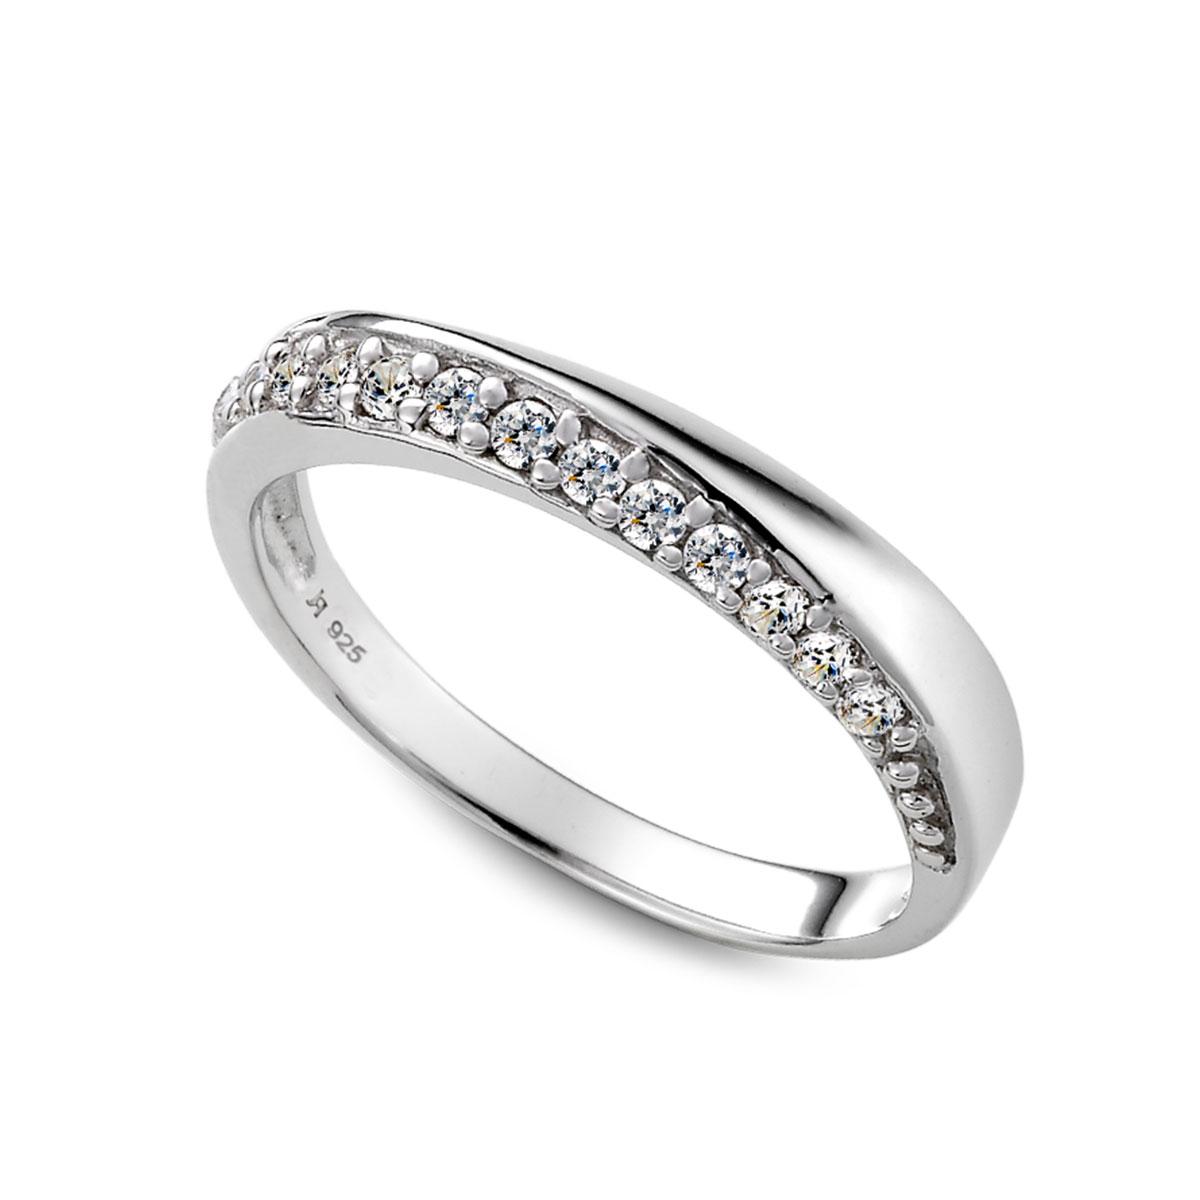 KSW257 星空美鑽戒指